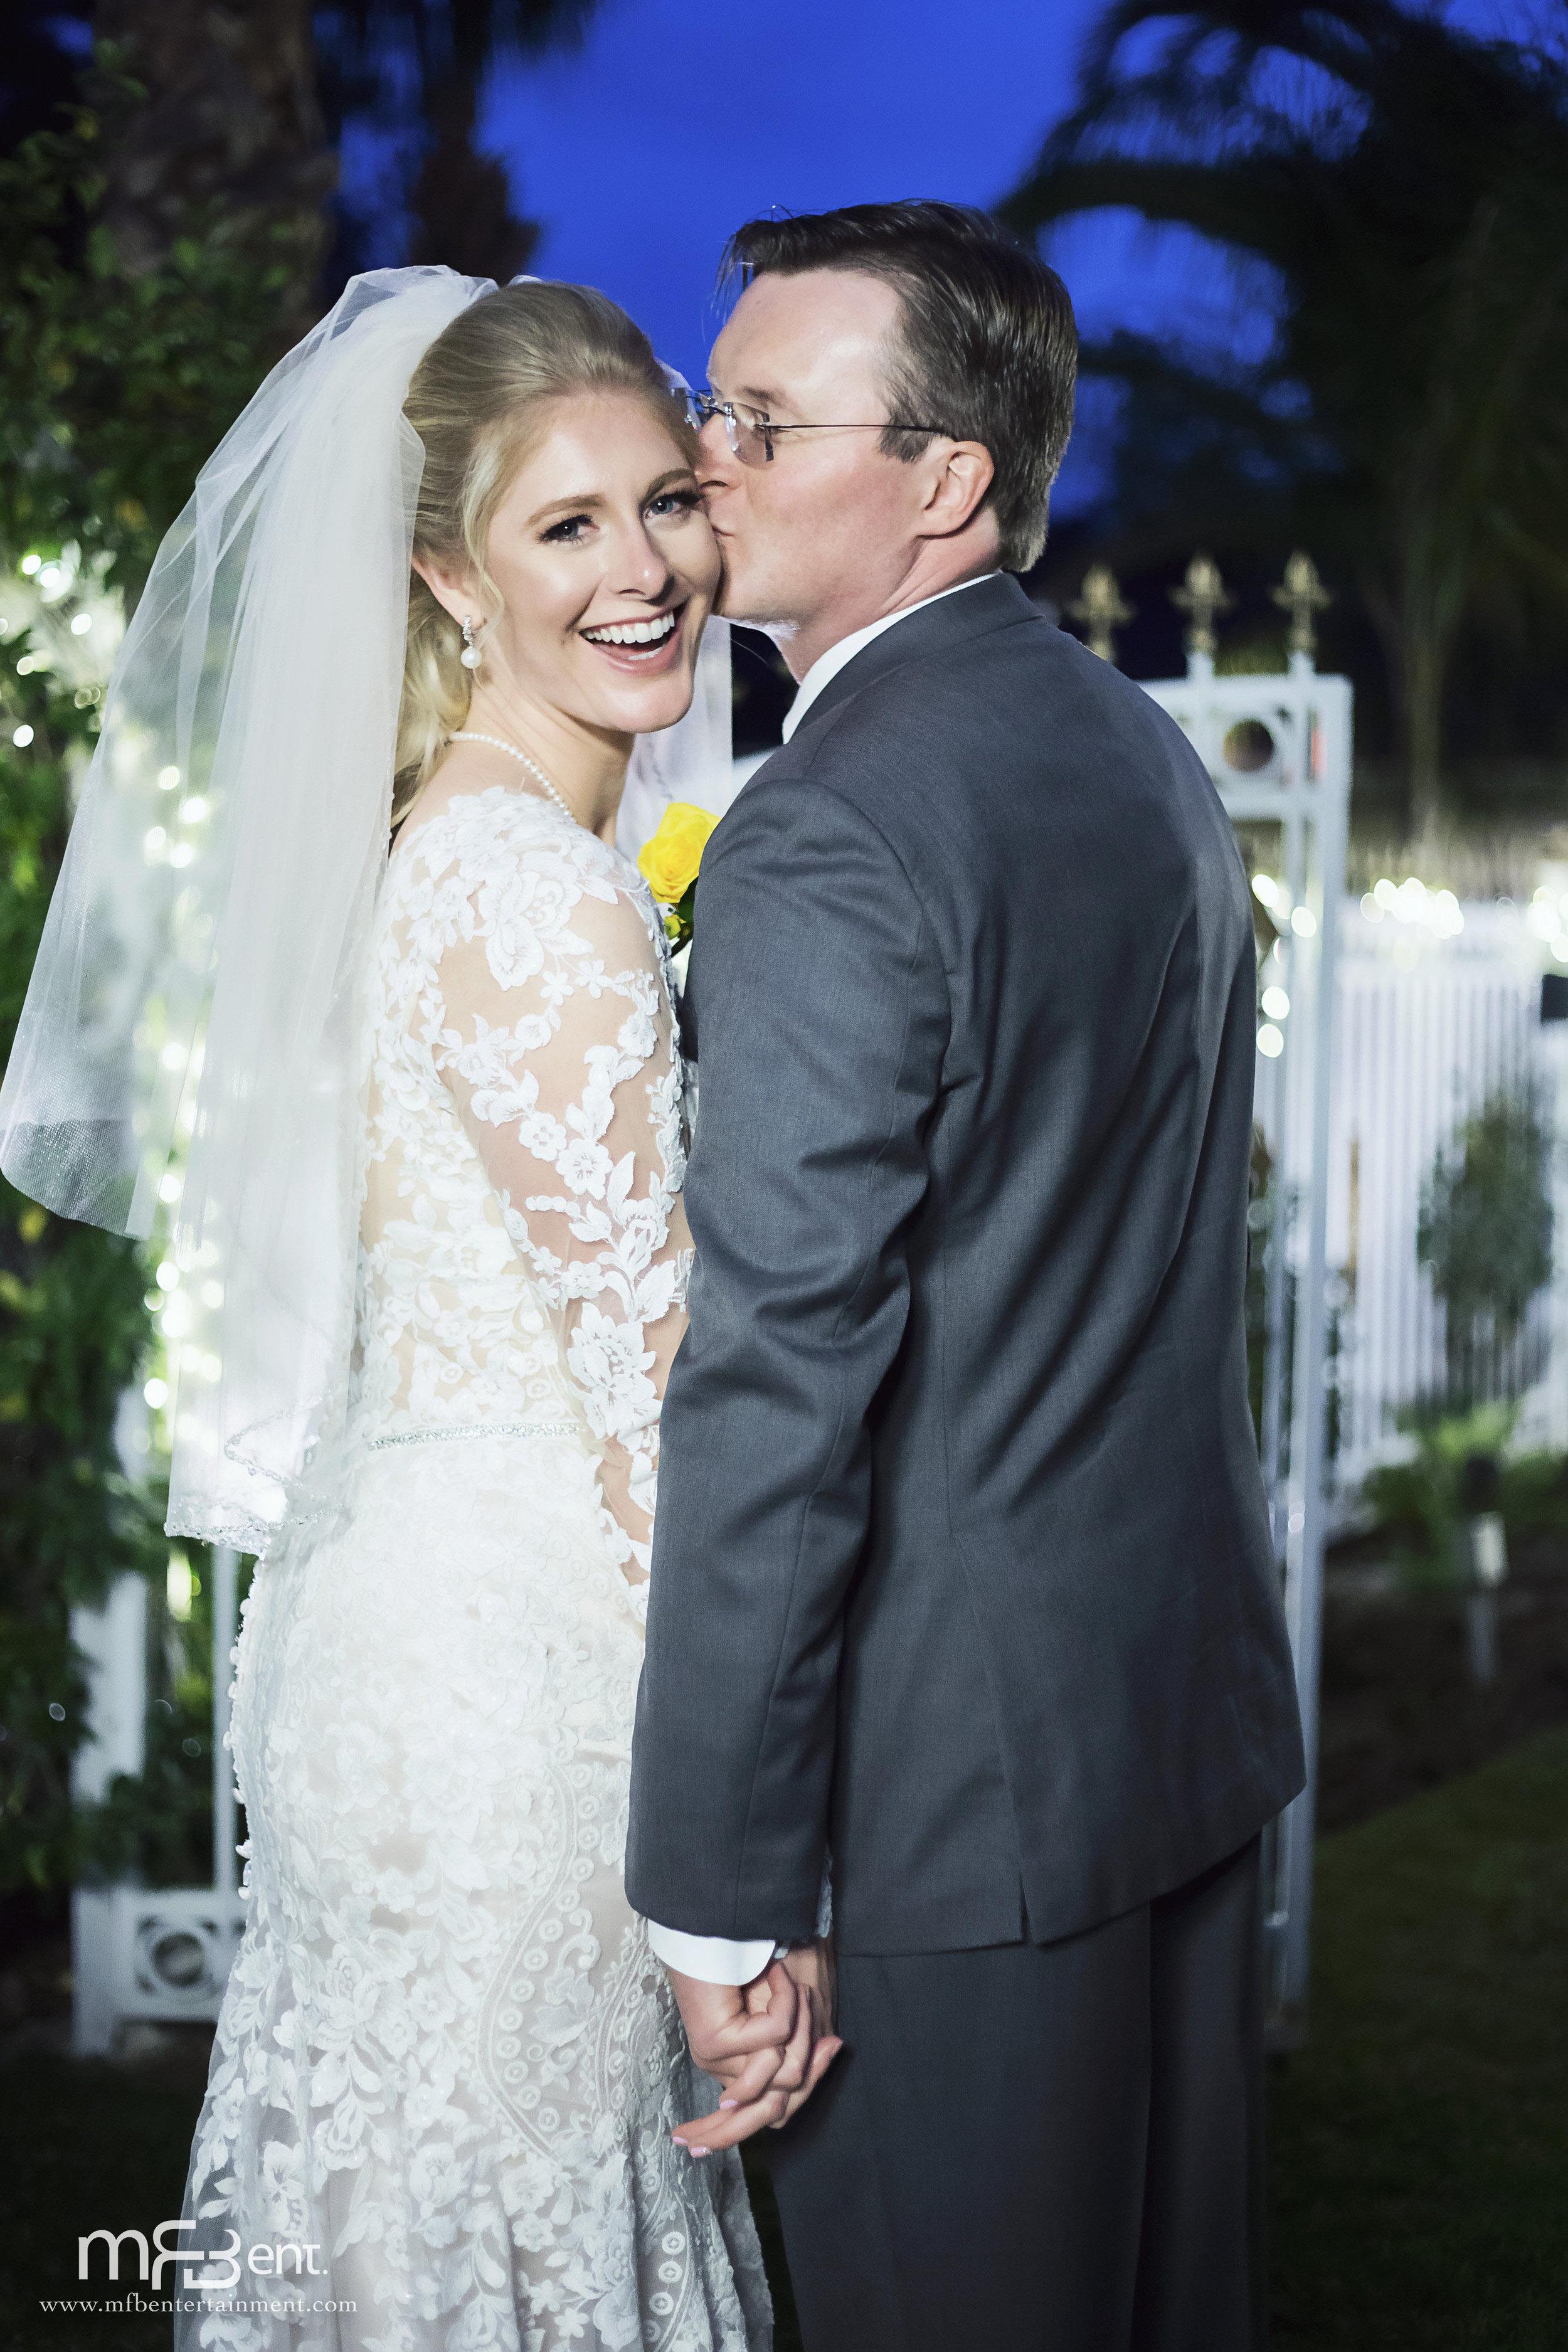 PIOTR CHELSEA WEDDING-PHOTO SESSION-0083 L.jpg